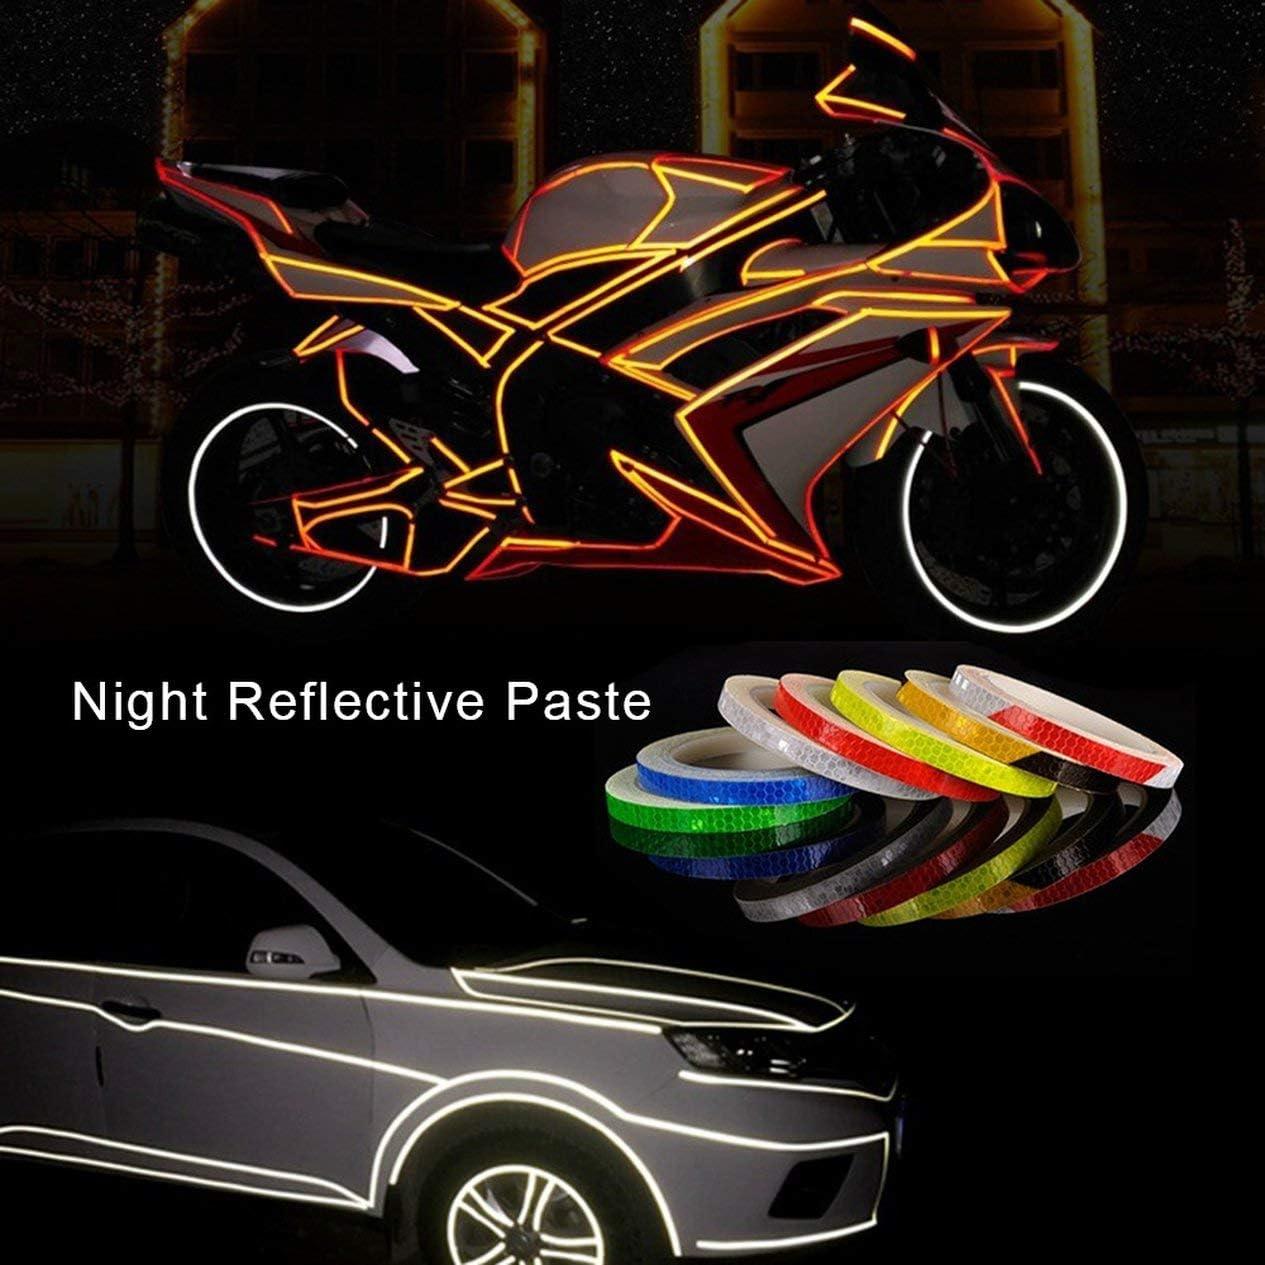 EdBerk74 Pegatinas Reflectantes para Bicicletas Accesorios para Bicicletas de monta/ña Equipo de Seguridad Luminosa Dead Fly Bicycle Motorcycle Wheel Body Sticker